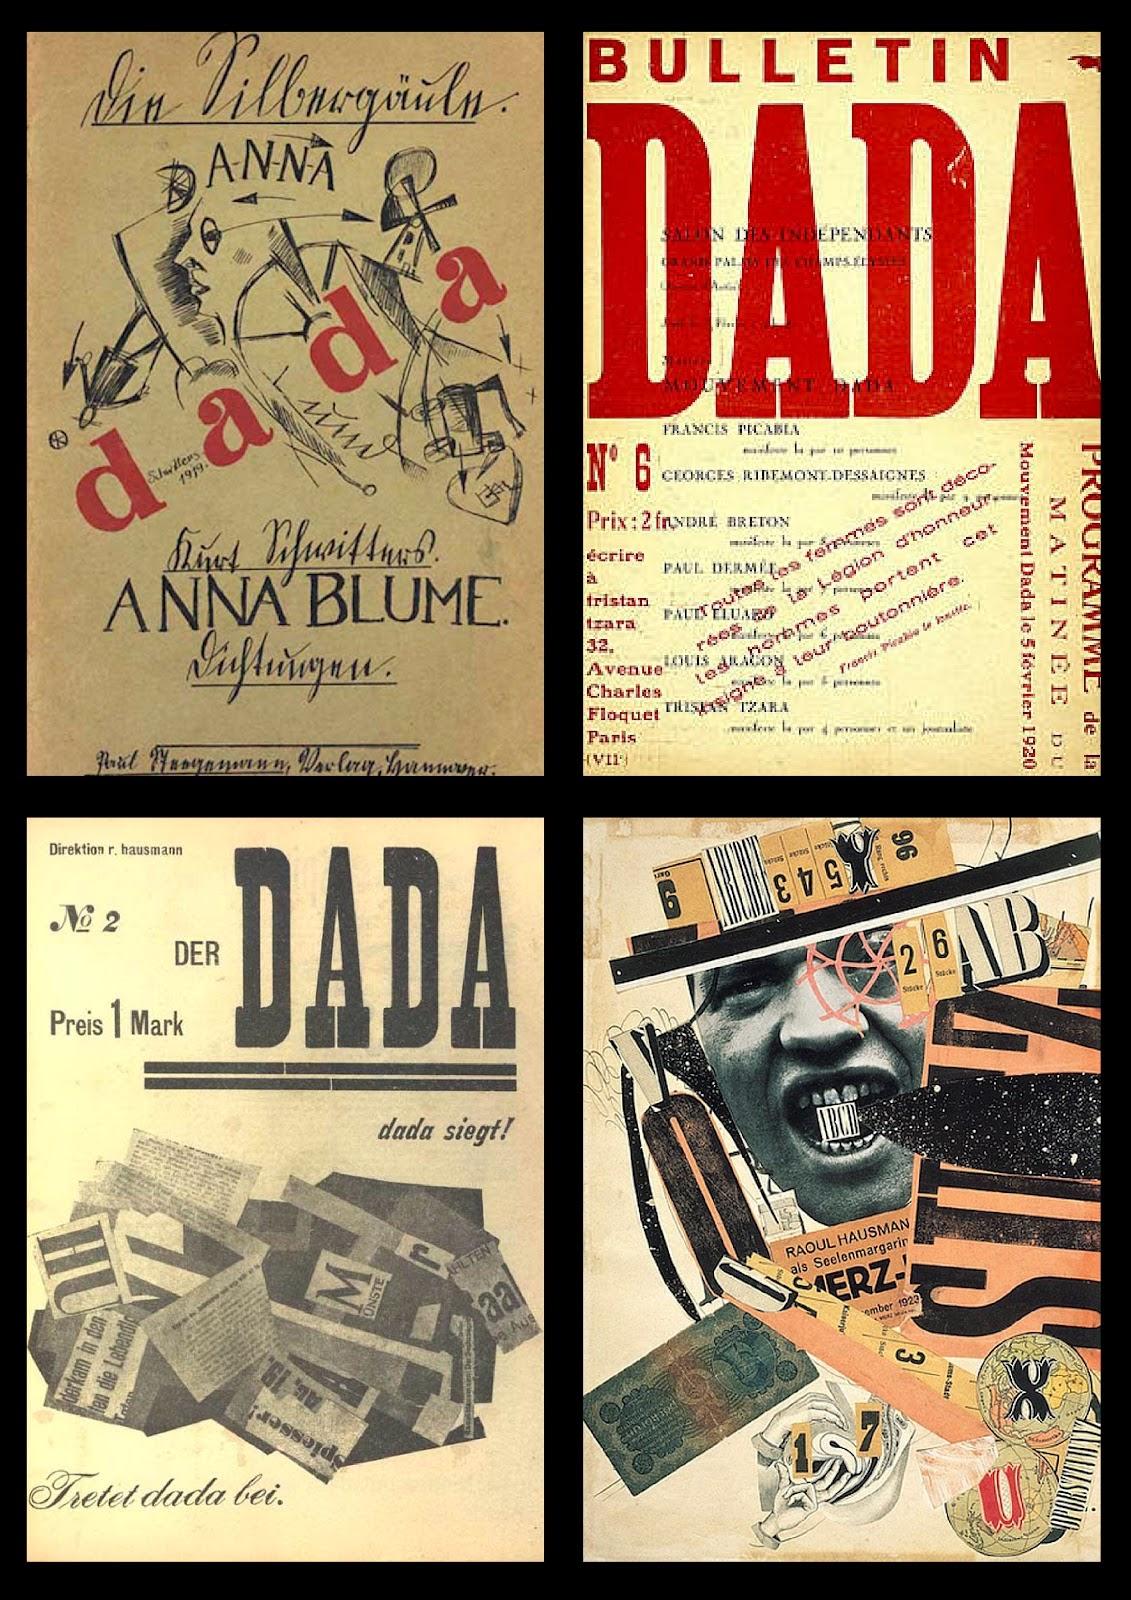 Amelia Baron ~level 3 Art and Design~: The Dada Art Movement